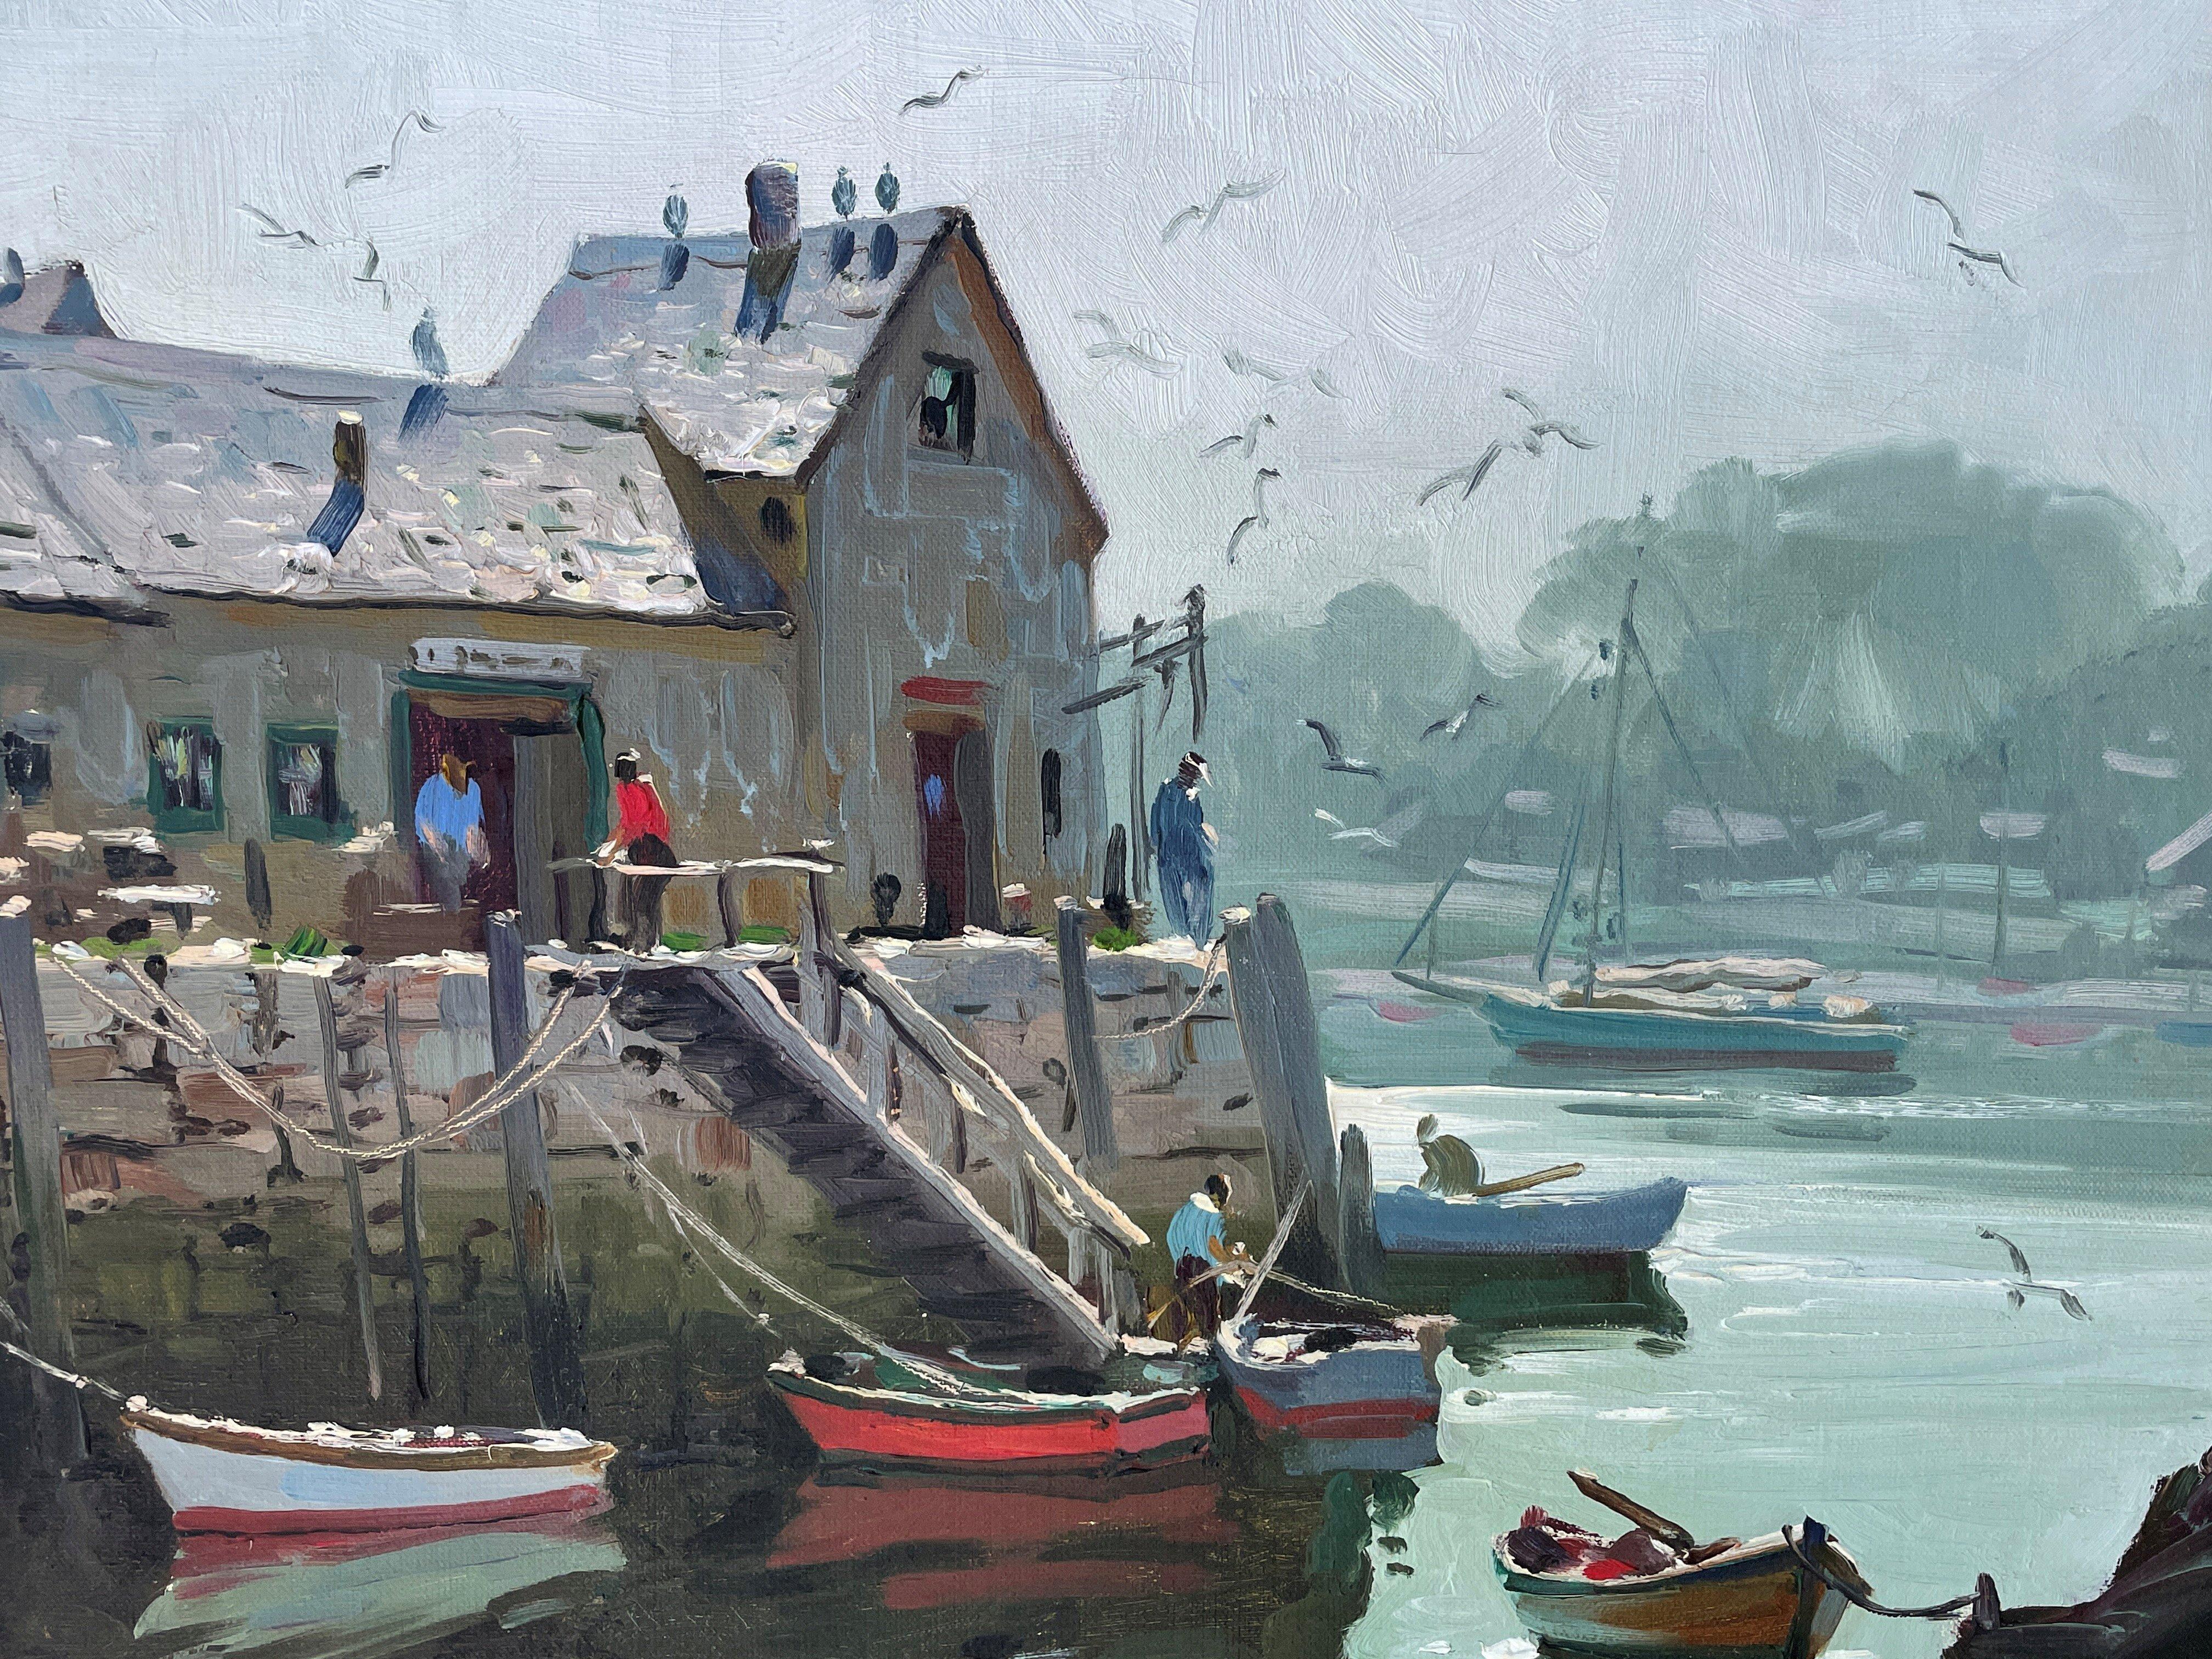 """Motif No. 1, Rockport, Massachusetts,"" Paul Strisik, New England Boats and Dock"